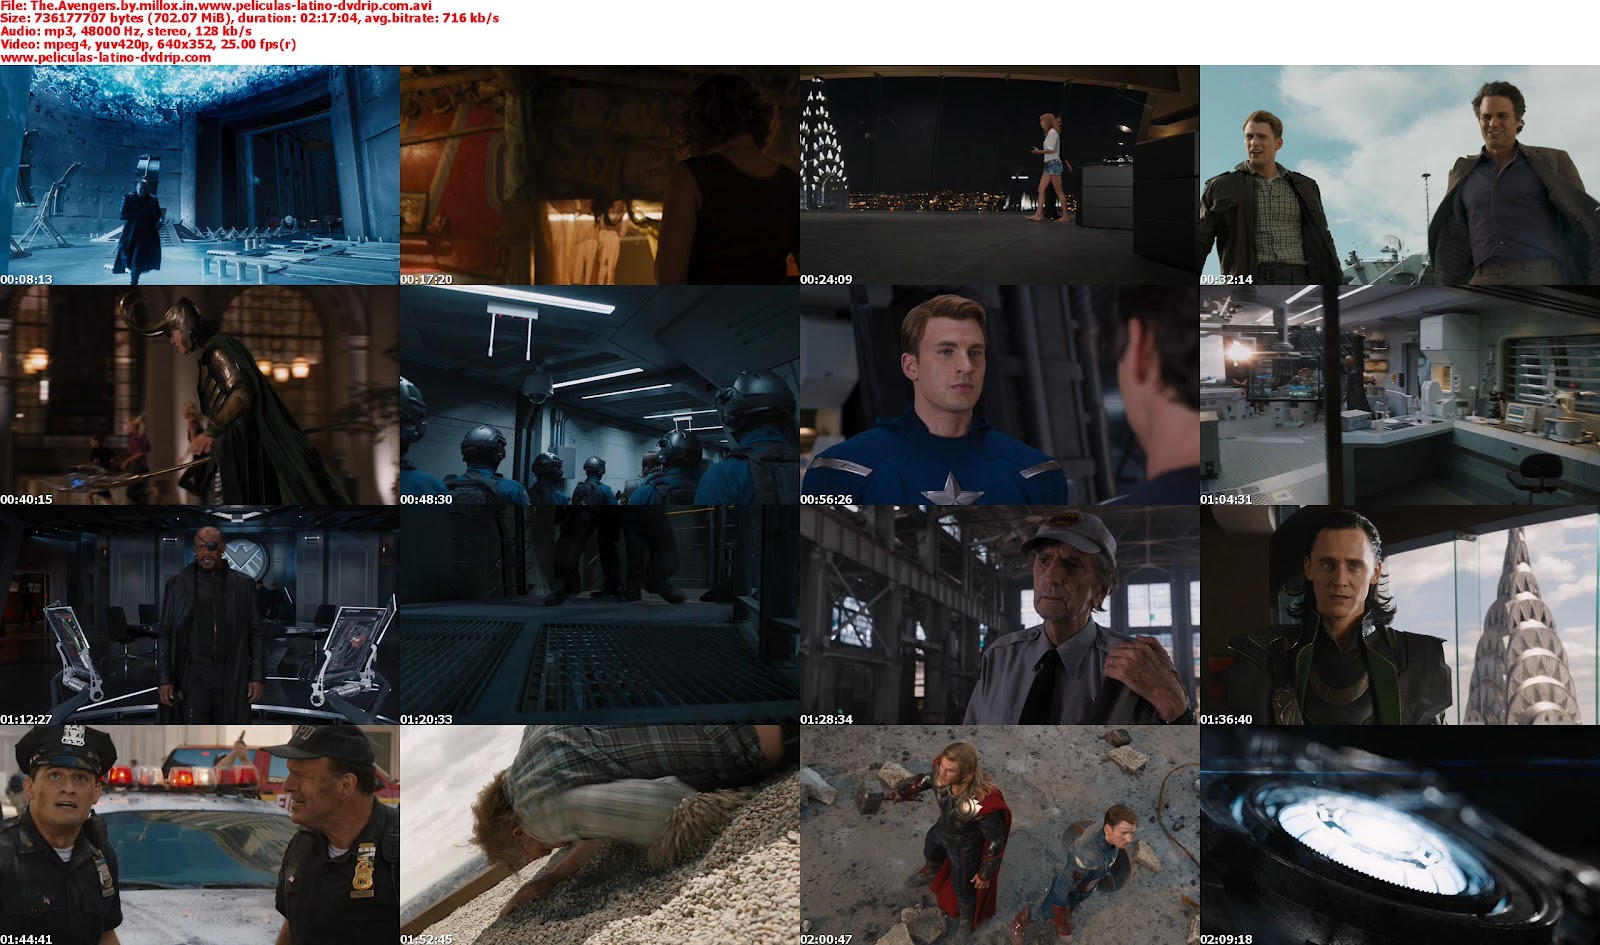 http://2.bp.blogspot.com/-2kkw7j7-mLA/UDul-Wy05tI/AAAAAAAAD9U/rvmeDxEl9VE/s1600/The.Avengers.by.millox.in.www.peliculas-latino-dvdrip.com_s.jpg